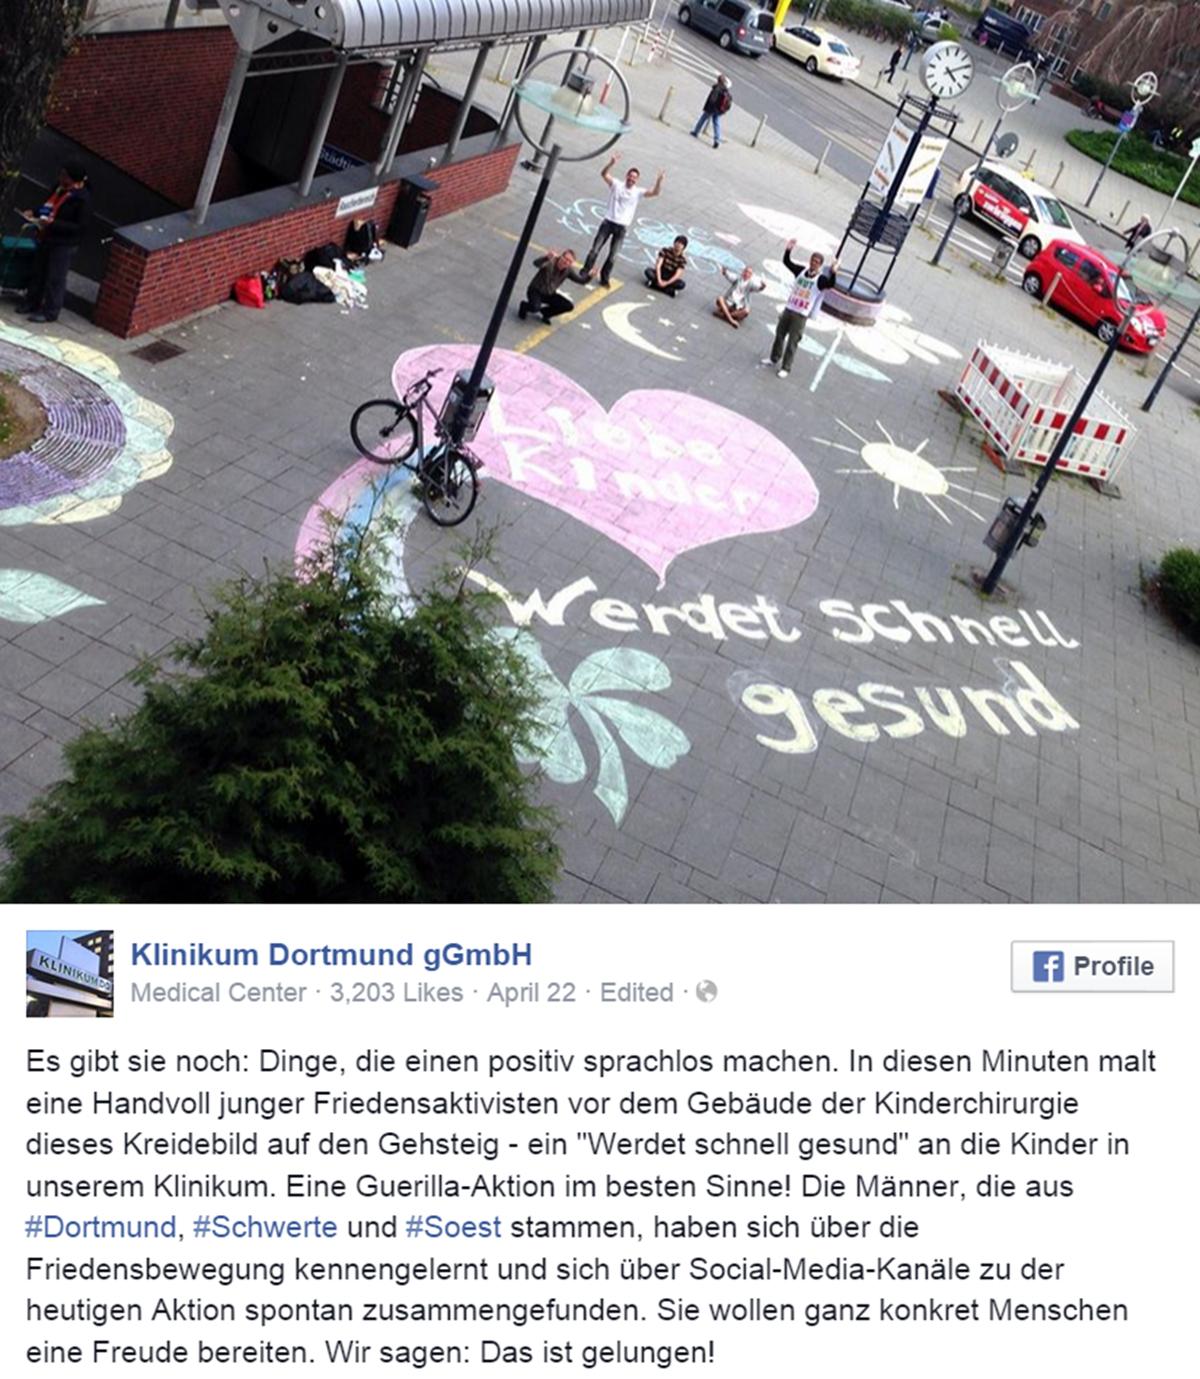 Facebook-Post des Klinikums Dortmund